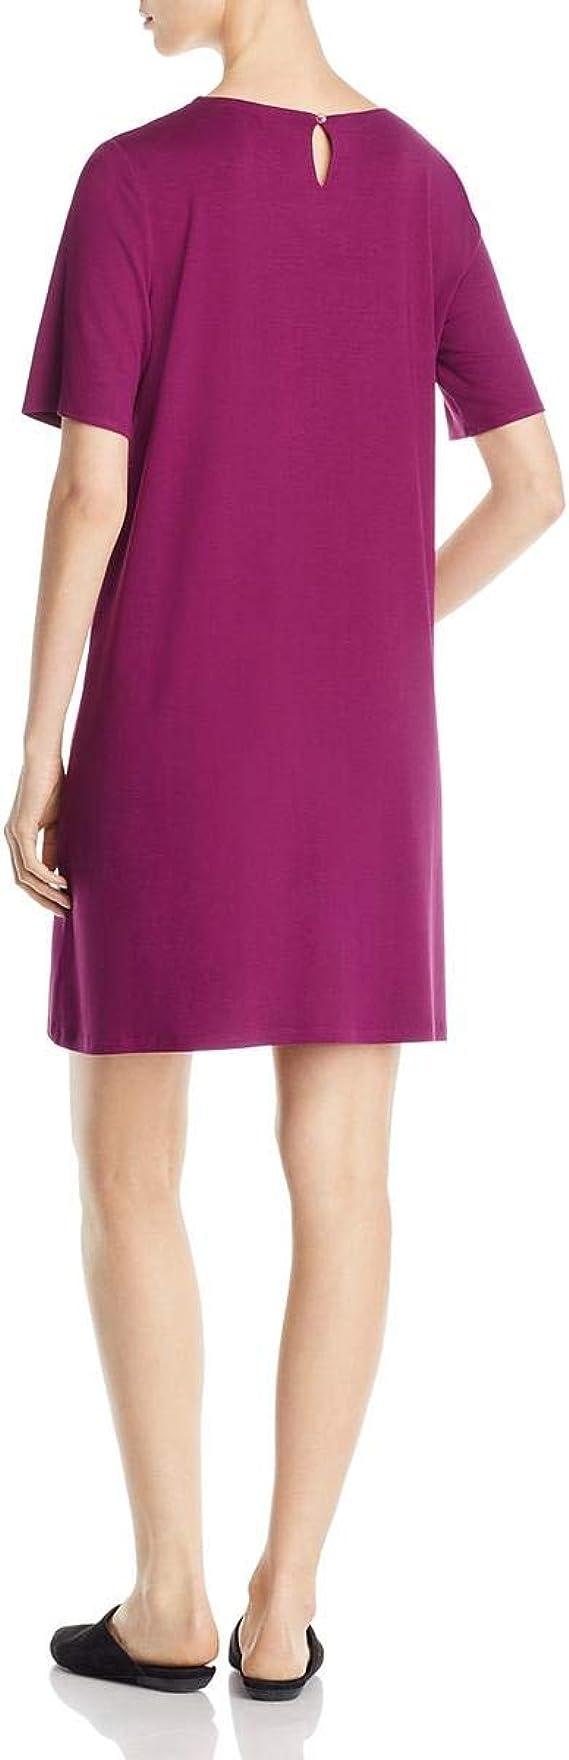 Eileen Fisher New Size L Boysenberry Purple Viscose Dress